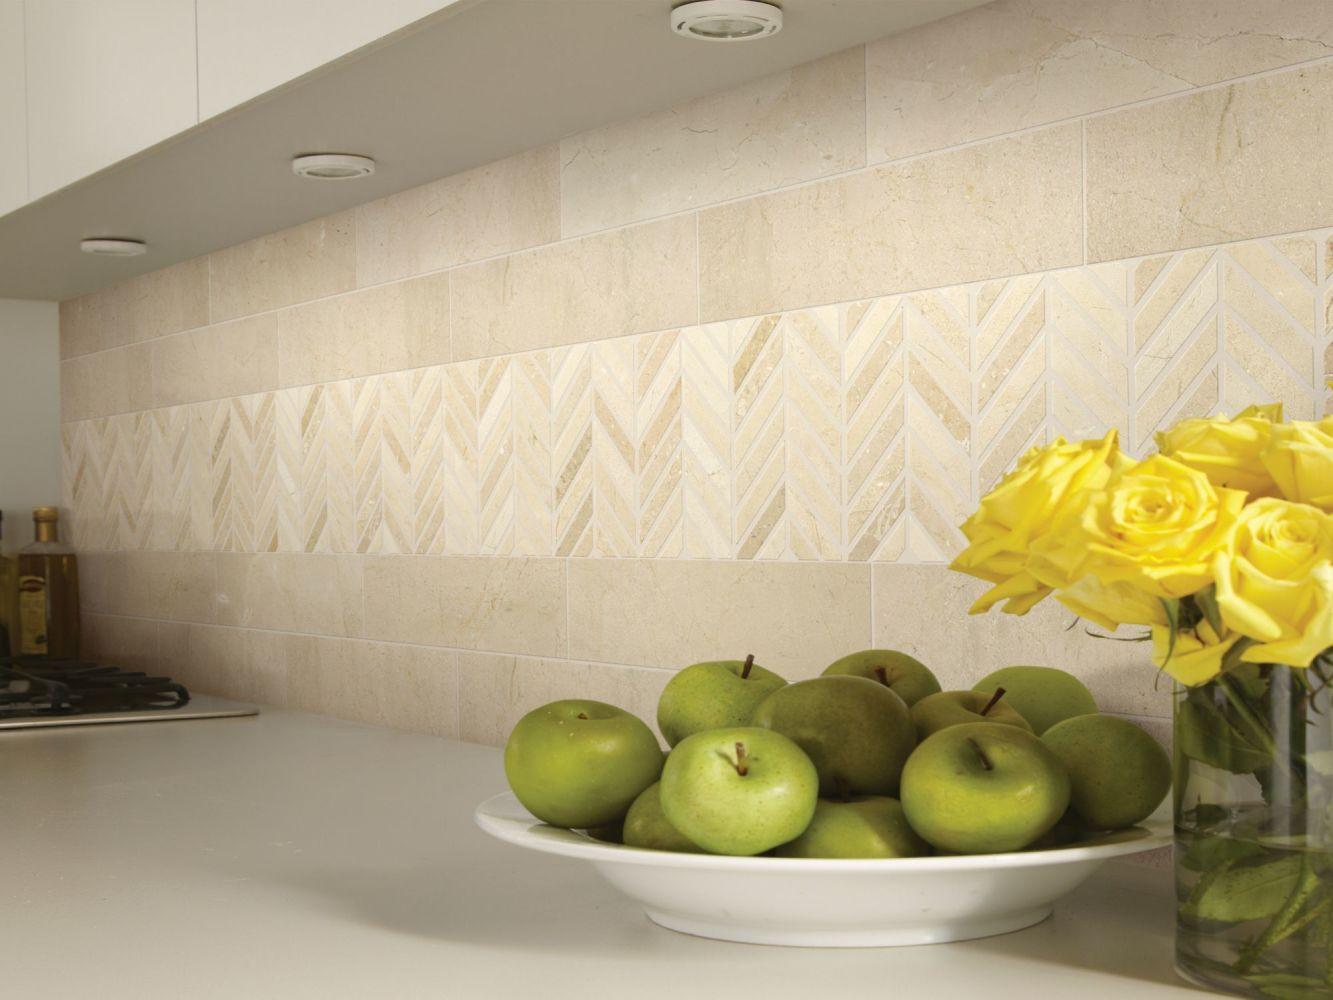 Shaw Floors Home Fn Gold Ceramic Estate 4×16 Crema Marfil 00200_TG85B